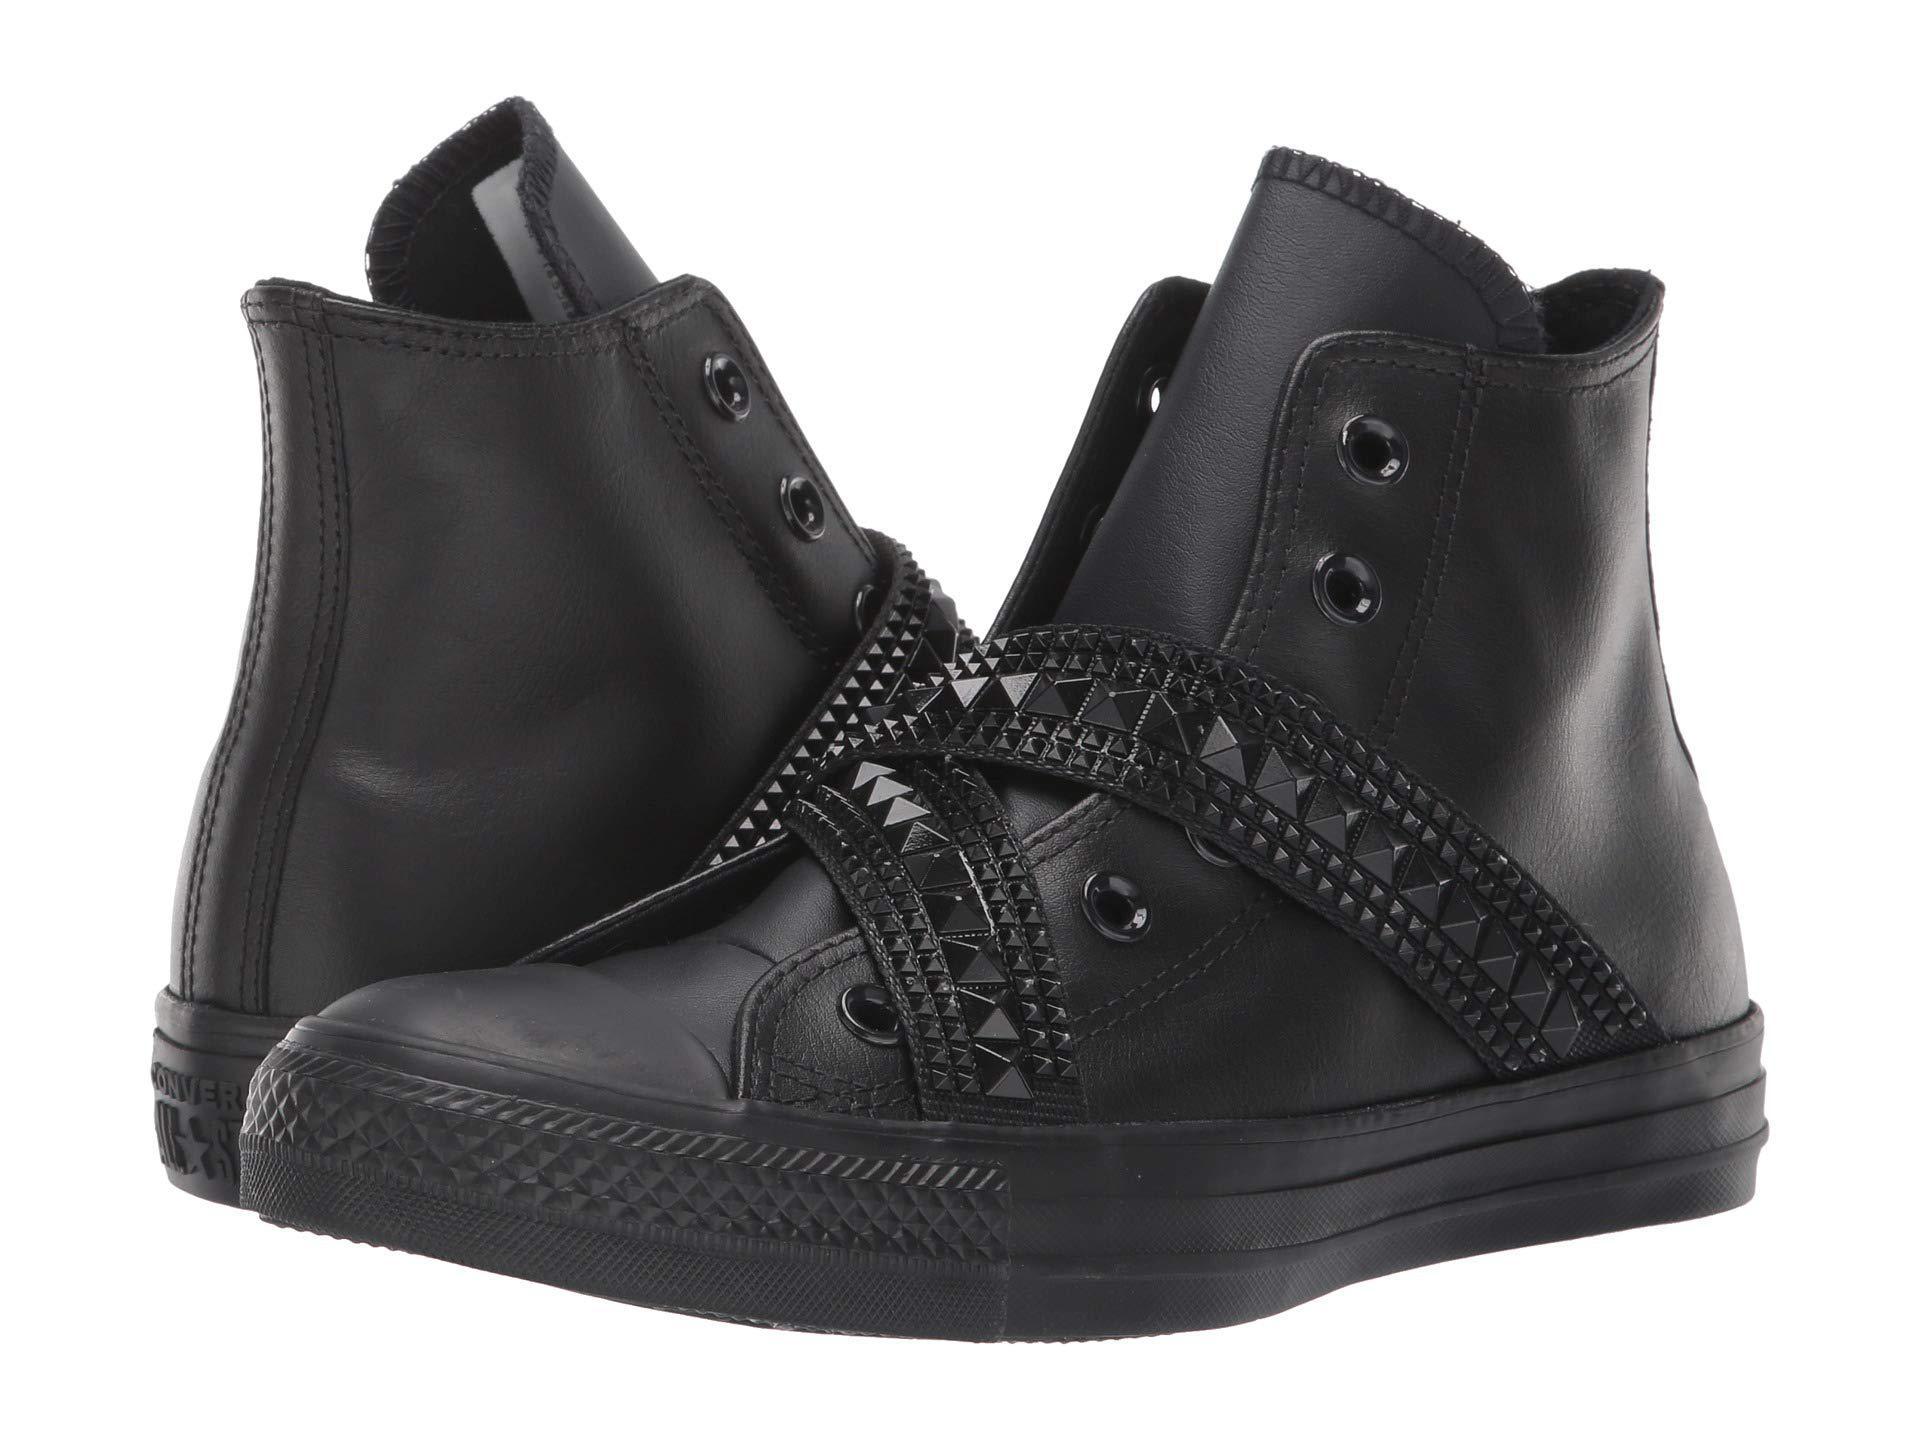 57f40eedf1f Lyst - Converse Chuck Taylor All Star Punk Strap - Hi (black black ...